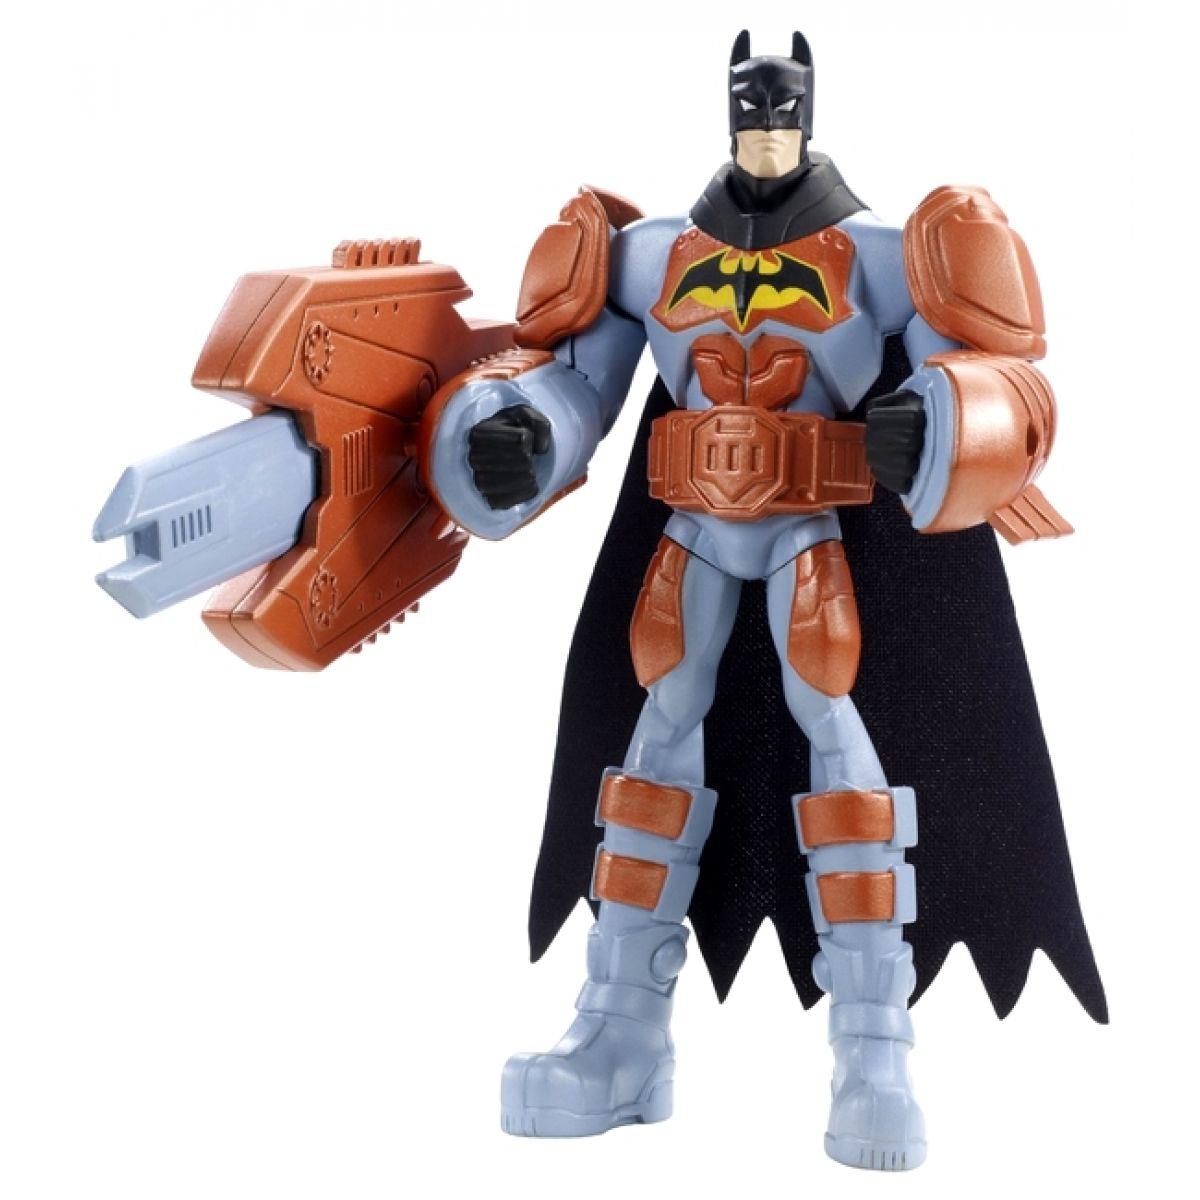 Batman bojové figurky Mattel W7256 - Batman Blade attack